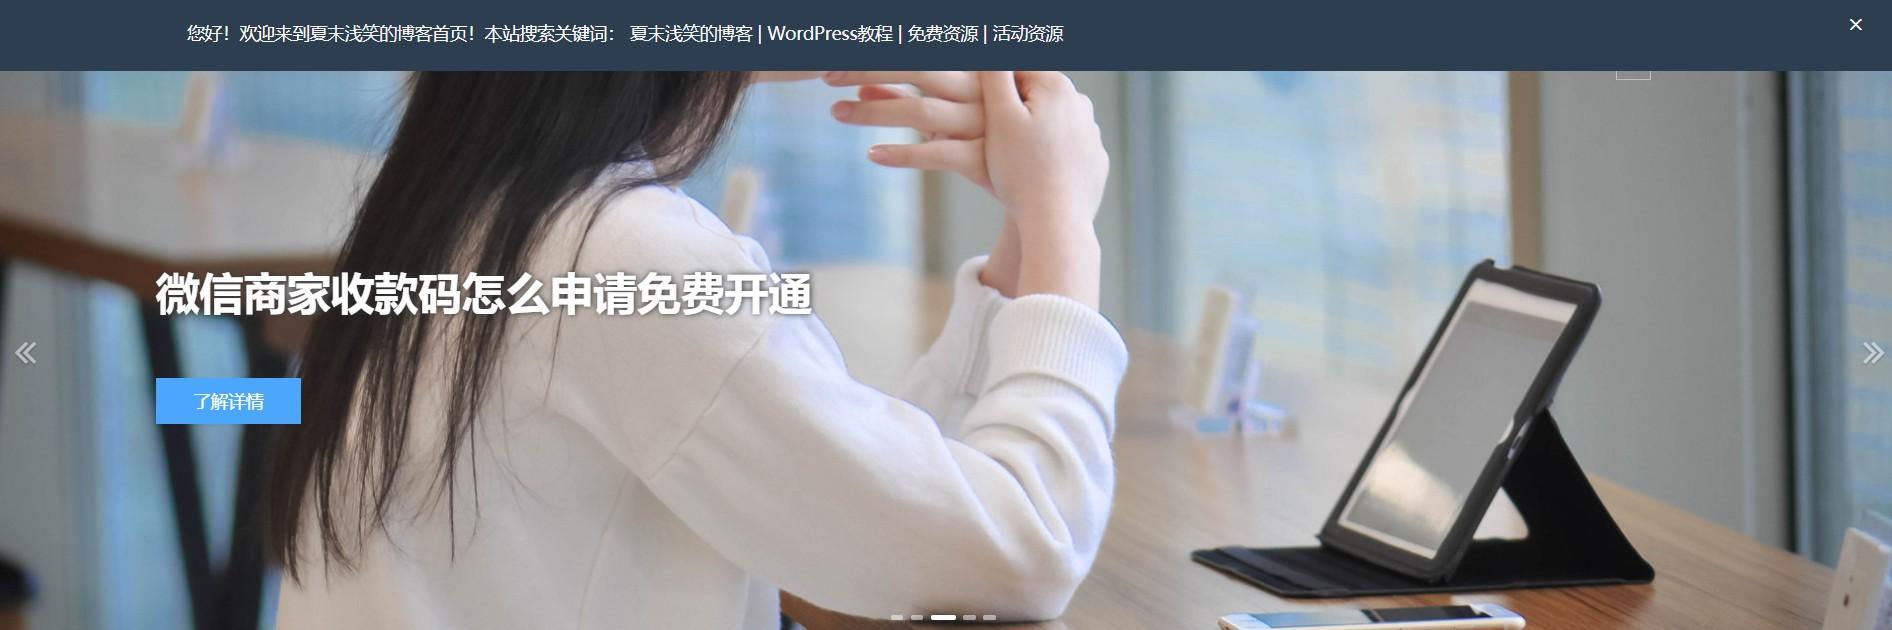 wordpress公告 | 通知栏HashBar汉化插件